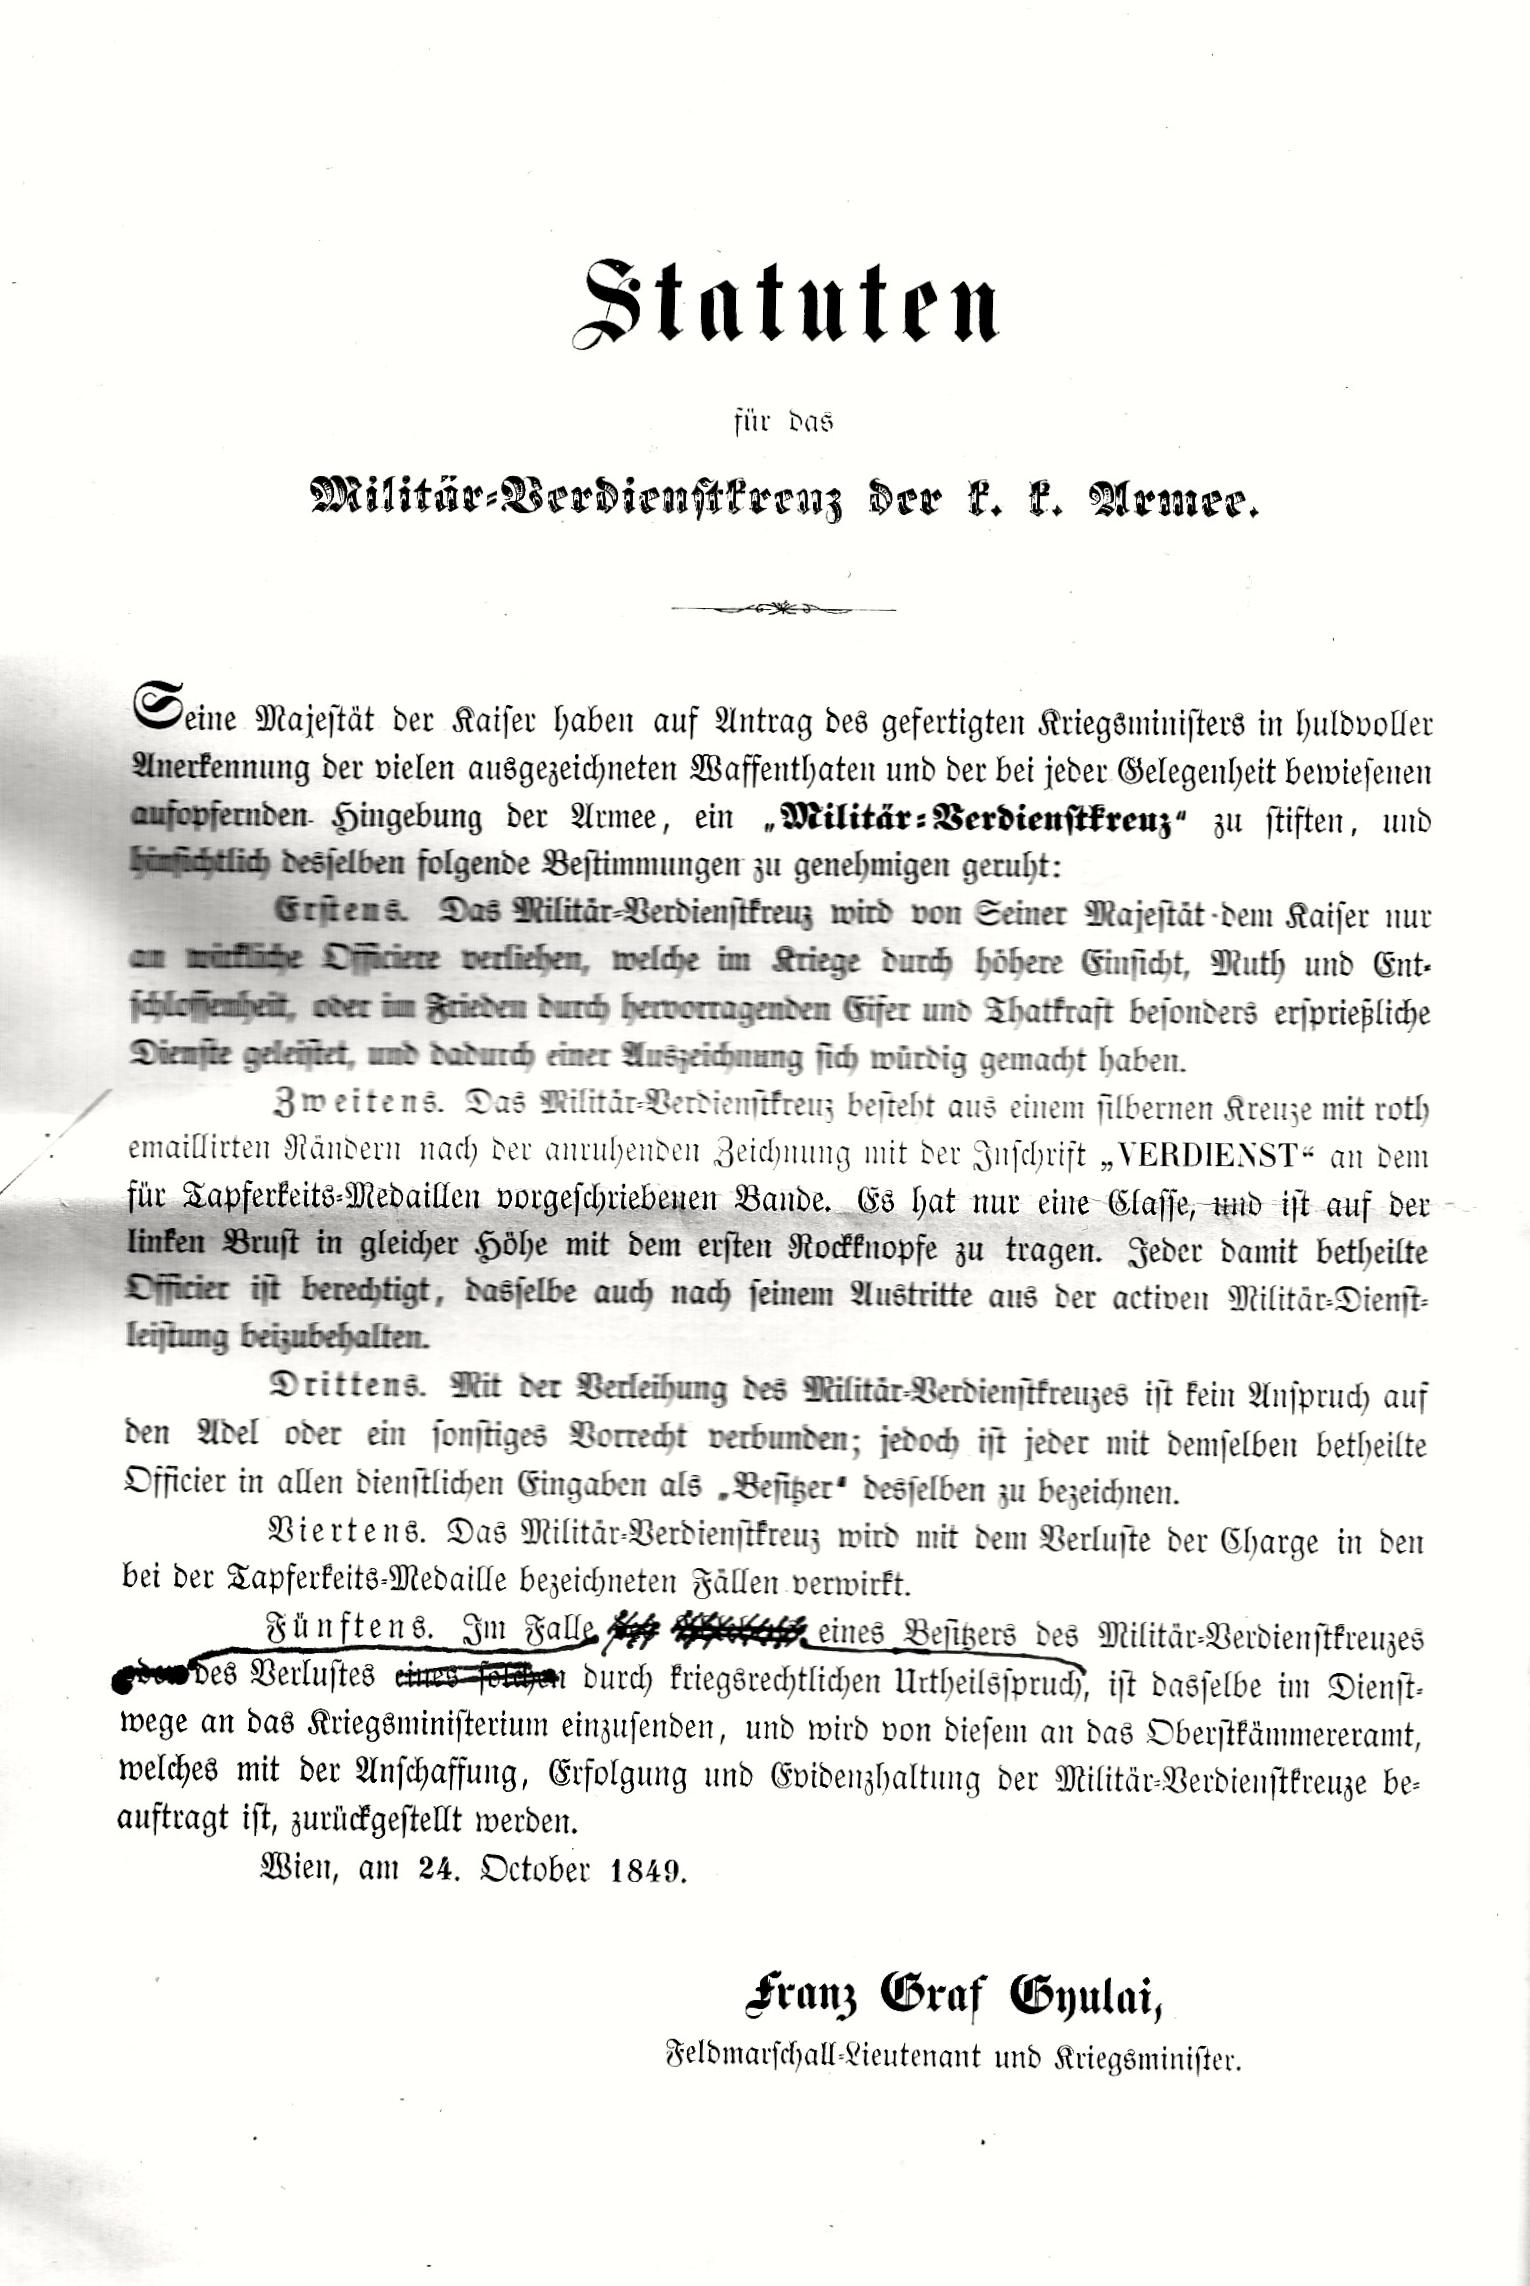 https://upload.wikimedia.org/wikipedia/de/e/e6/Statuten_f%C3%BCr_das_Milit%C3%A4r-Verdienstkreuz_der_k.k._Armee._Wien%2C_am_24._Oktober_1849._Franz_Graf_Gyulai._Feldmarschall-Leutnant_und_Kriegsminister._8.jpg